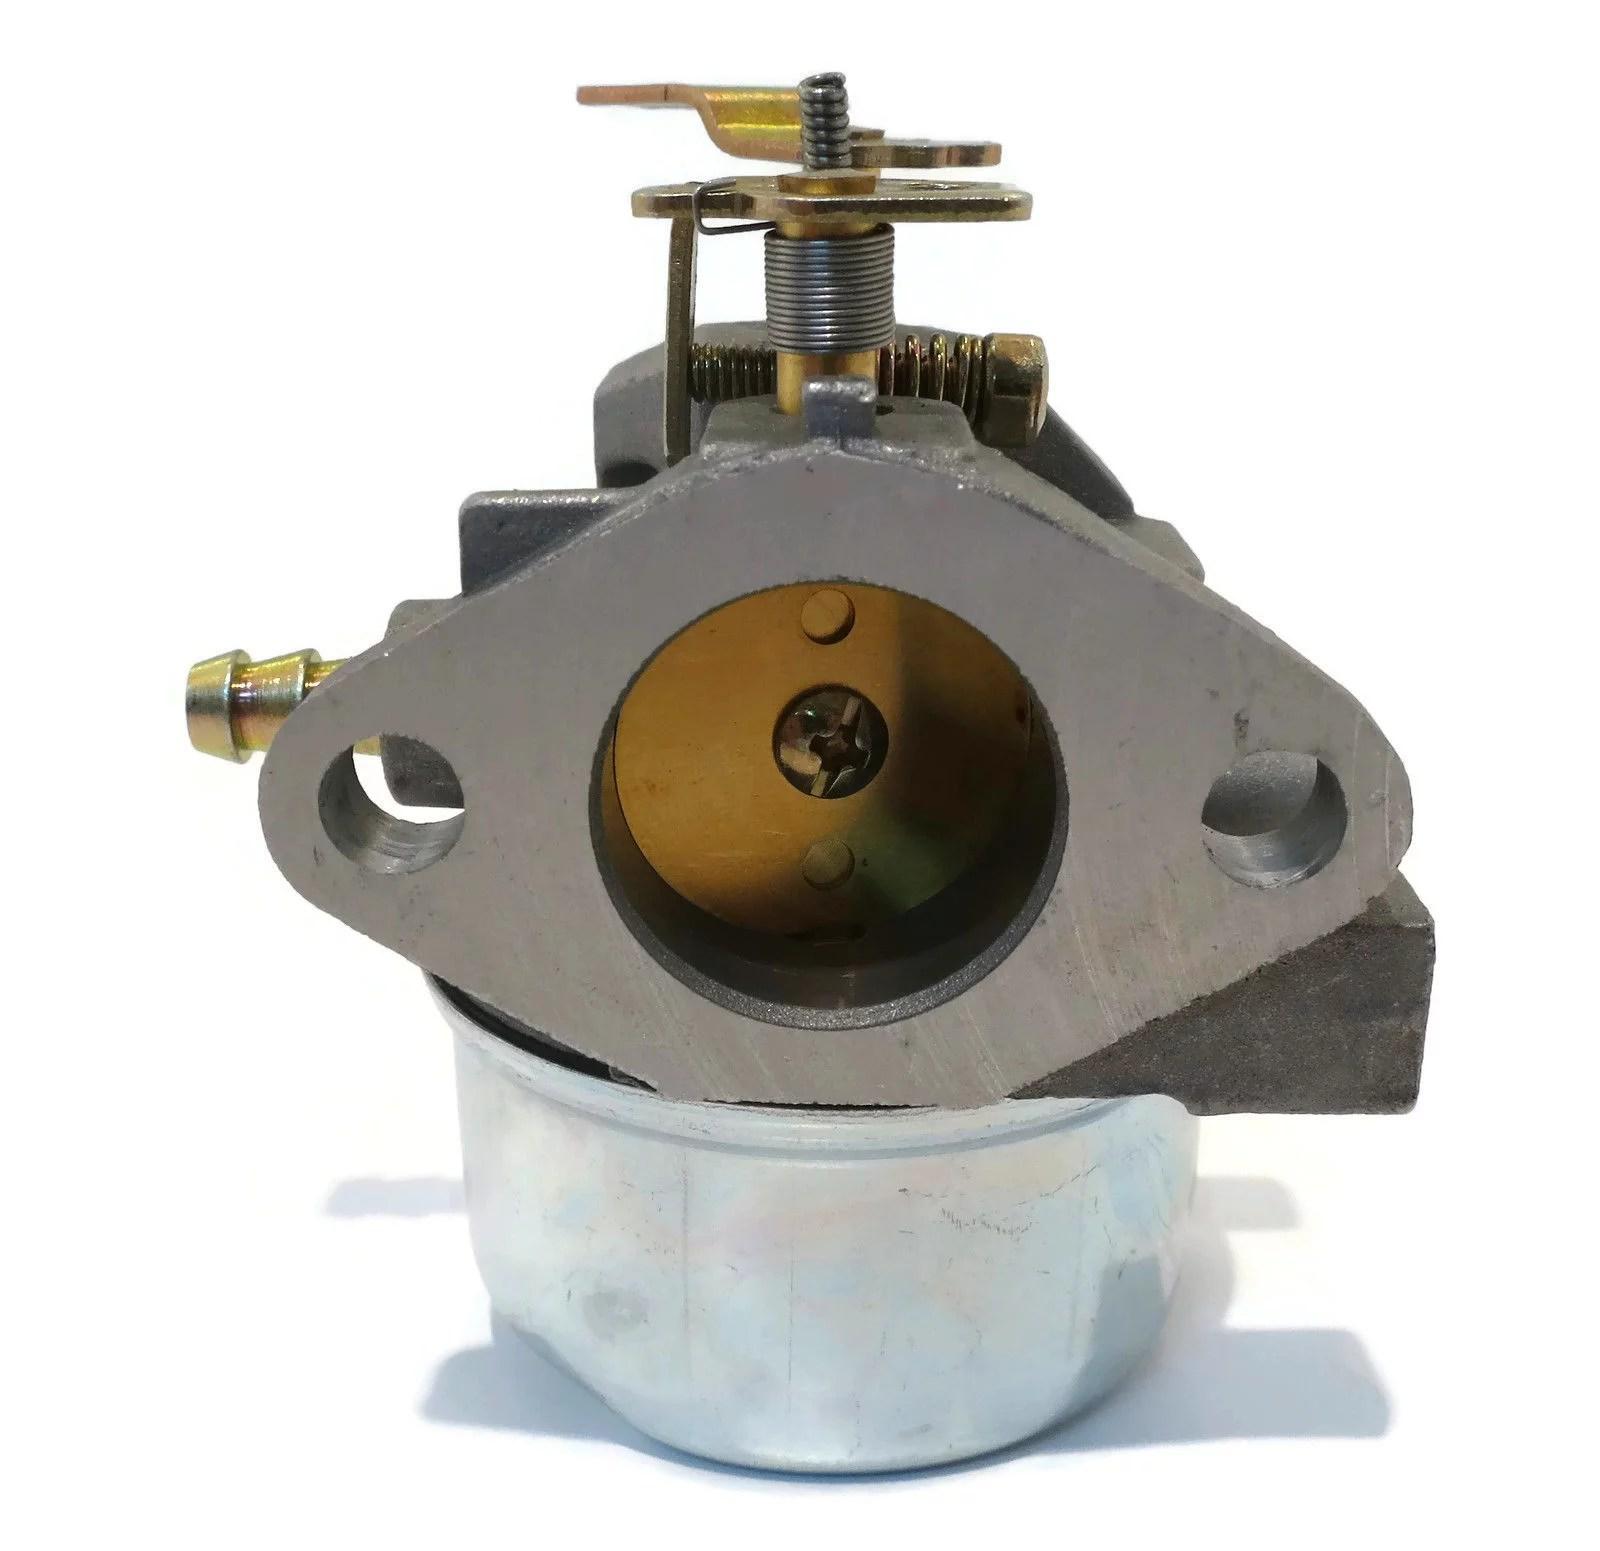 small resolution of carburetor carb for john deere snow blower thrower trs22 trs24 trs26carburetor carb for john deere snow